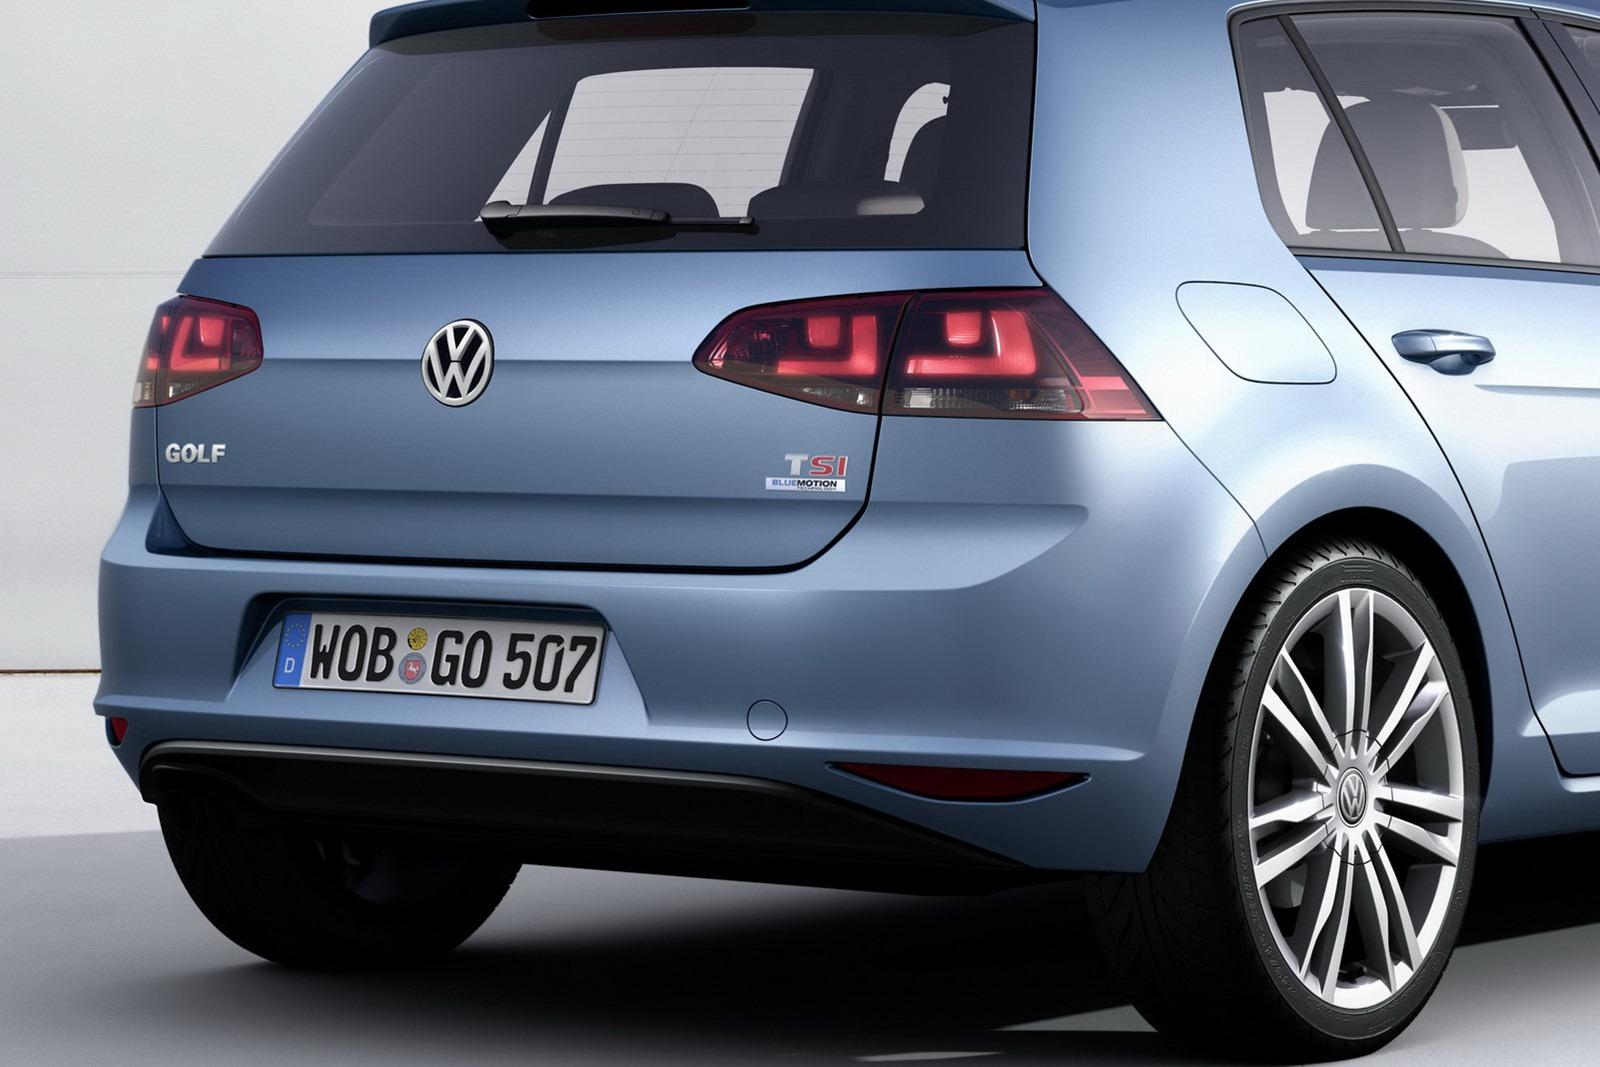 Volkswagen Golf Mk7 17 High Resolution Wallpaper Free Wallpaper